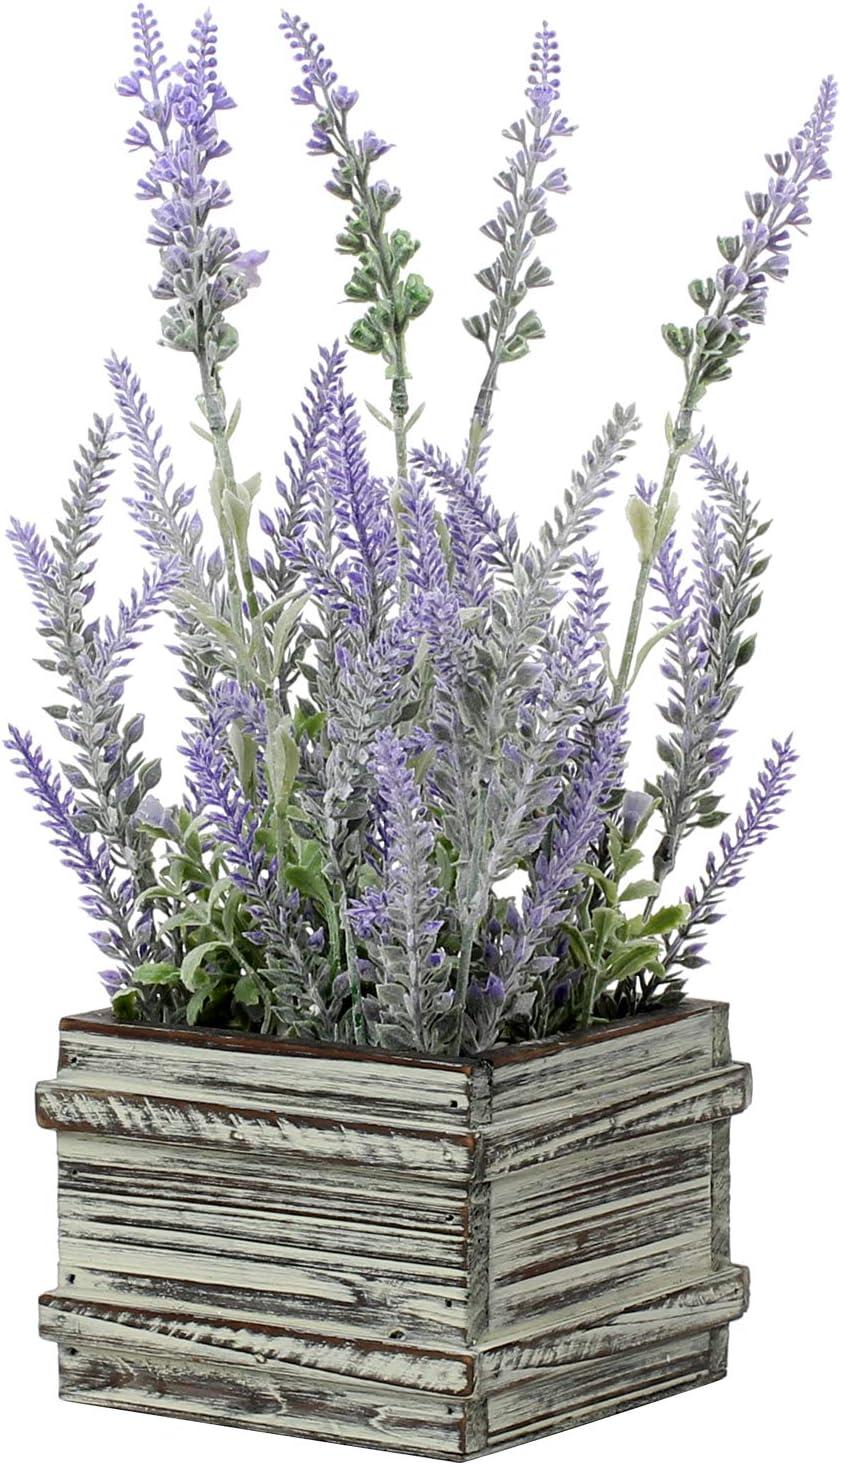 Artificial Lavender Decor Fake Lavender Plant in Rustic Wooden Box for Home Garden Wedding Decorations - Artificial Flowers - Purple Decor